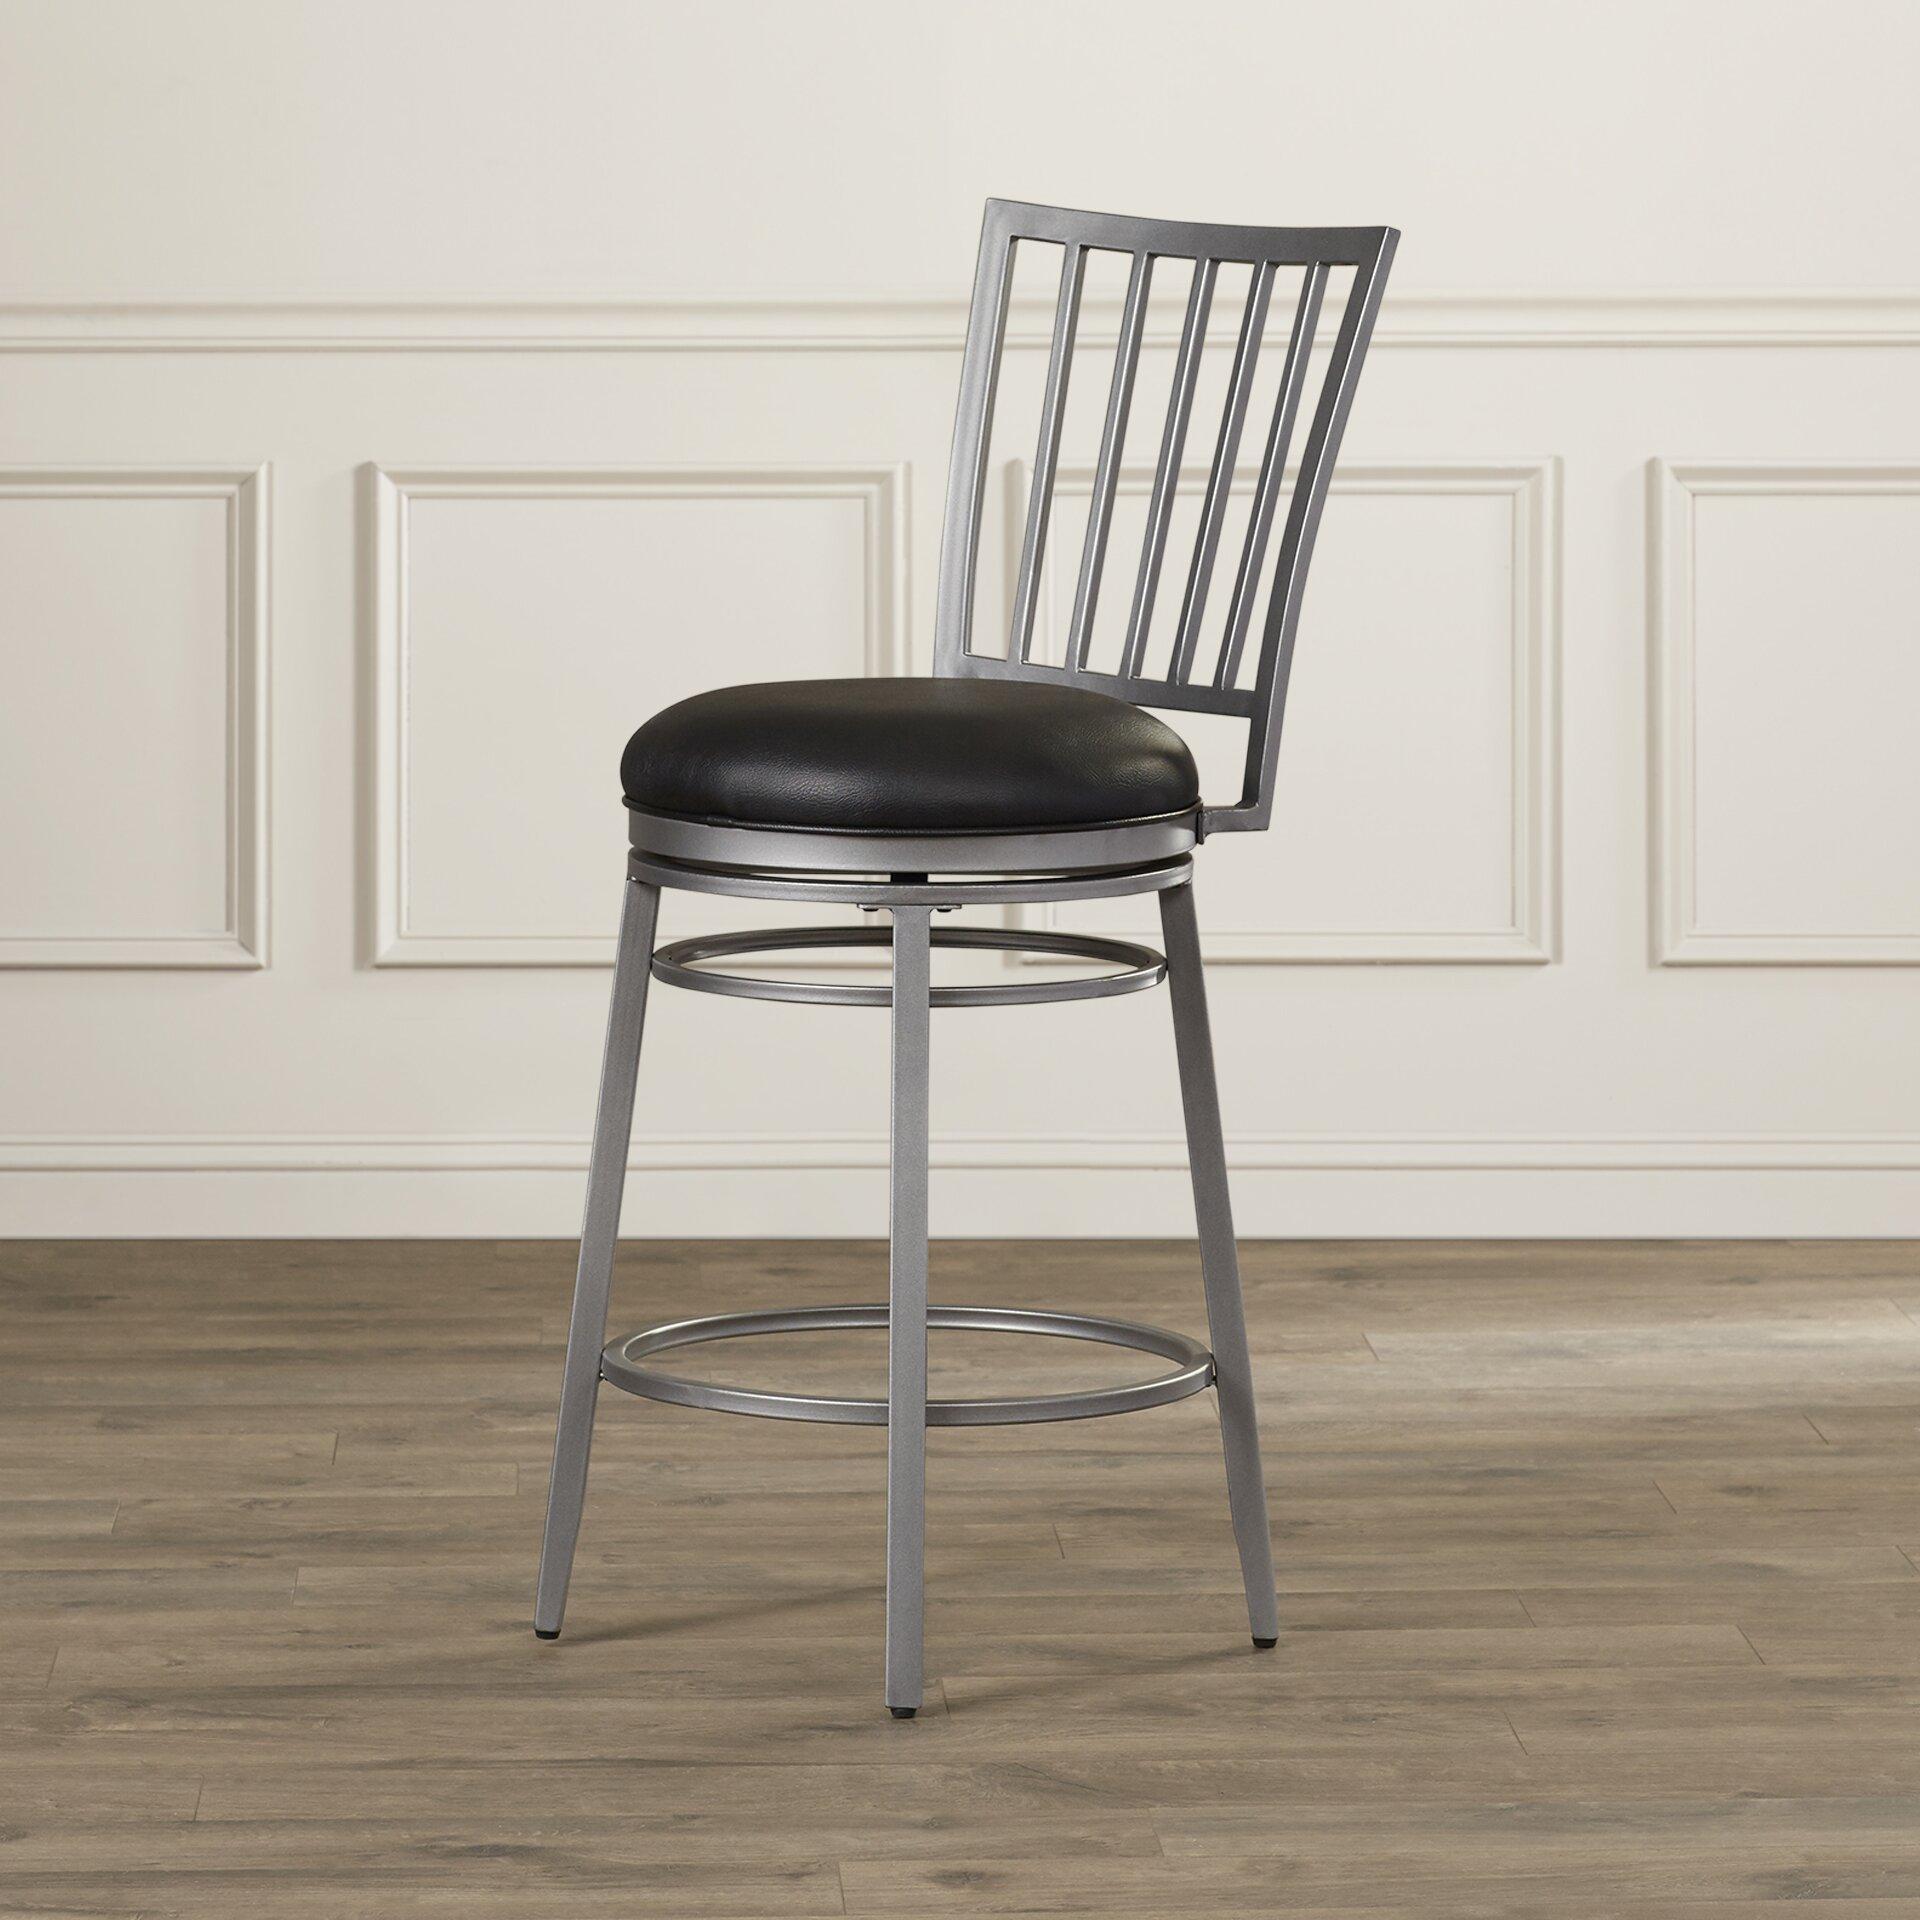 Bar Stools Rochester Ny Furniture Jack Greco